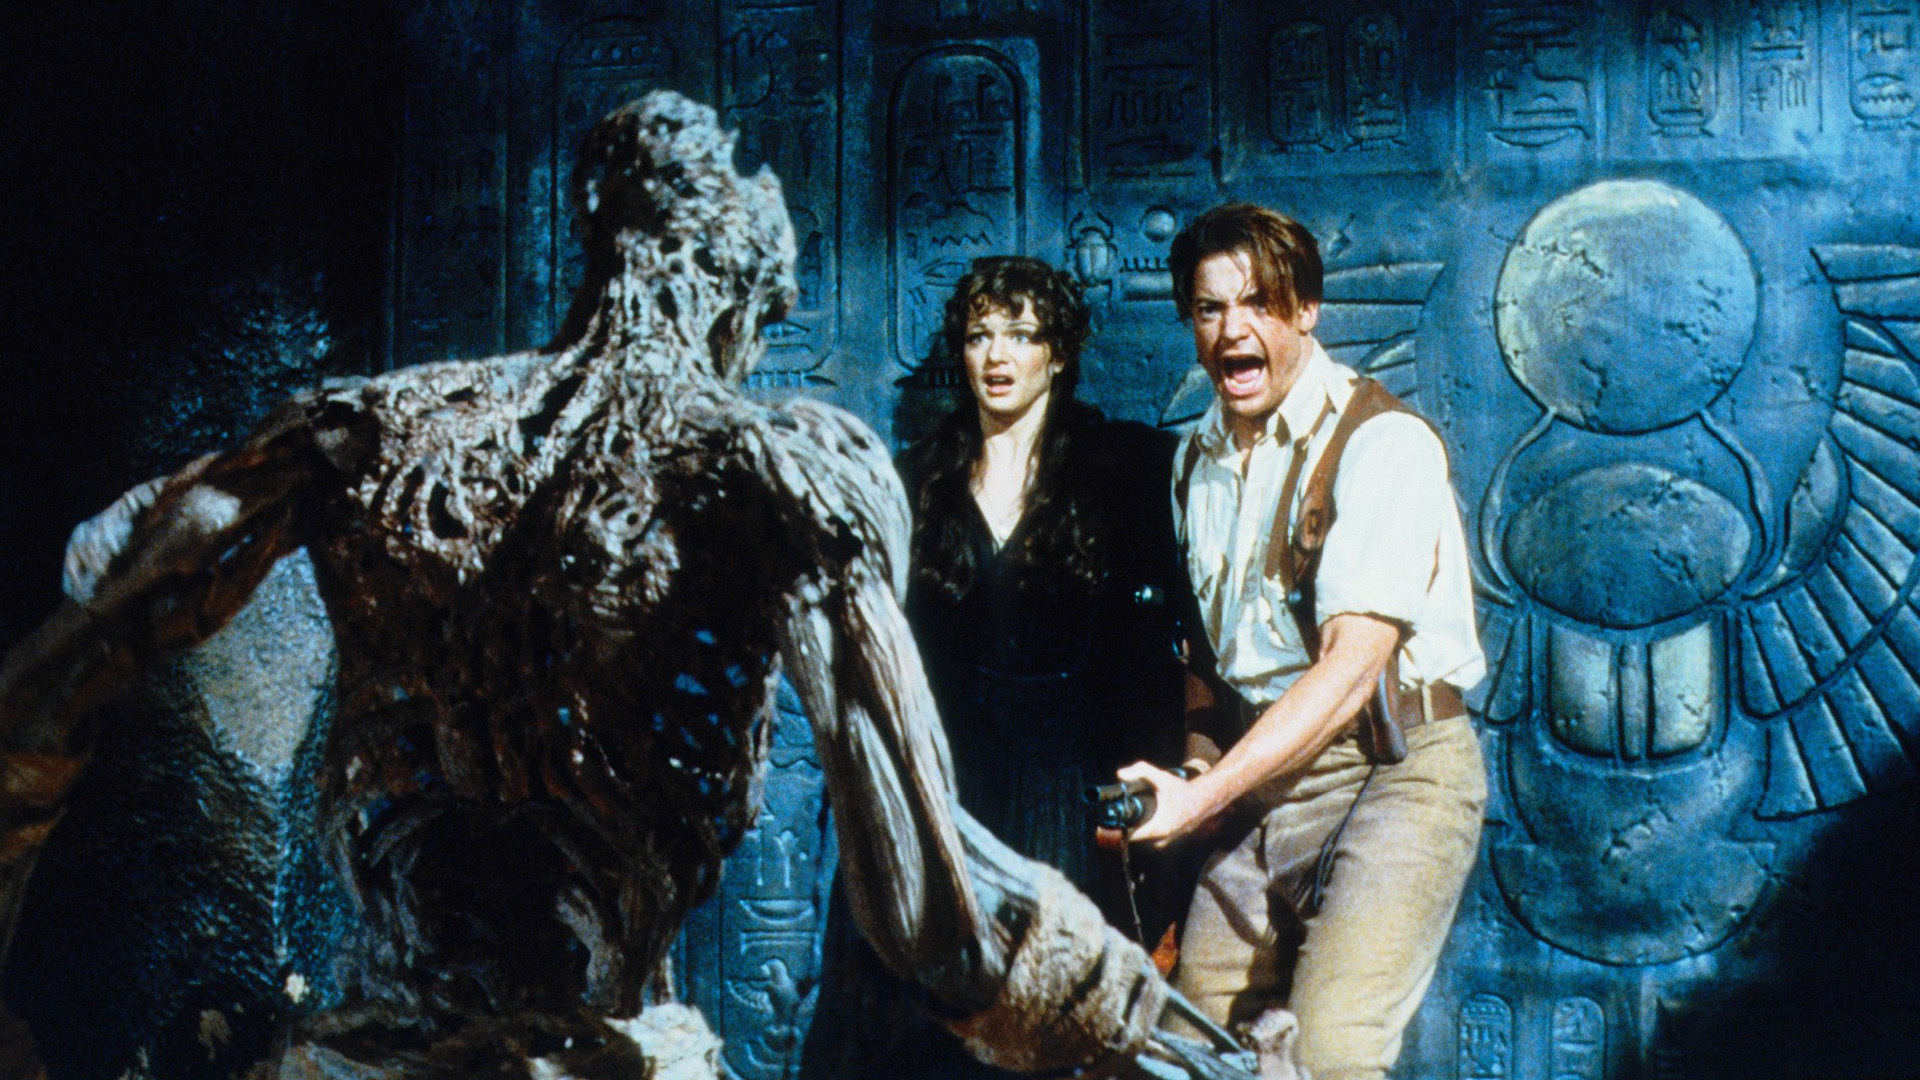 the mummy 1999 rewatching a modern classic